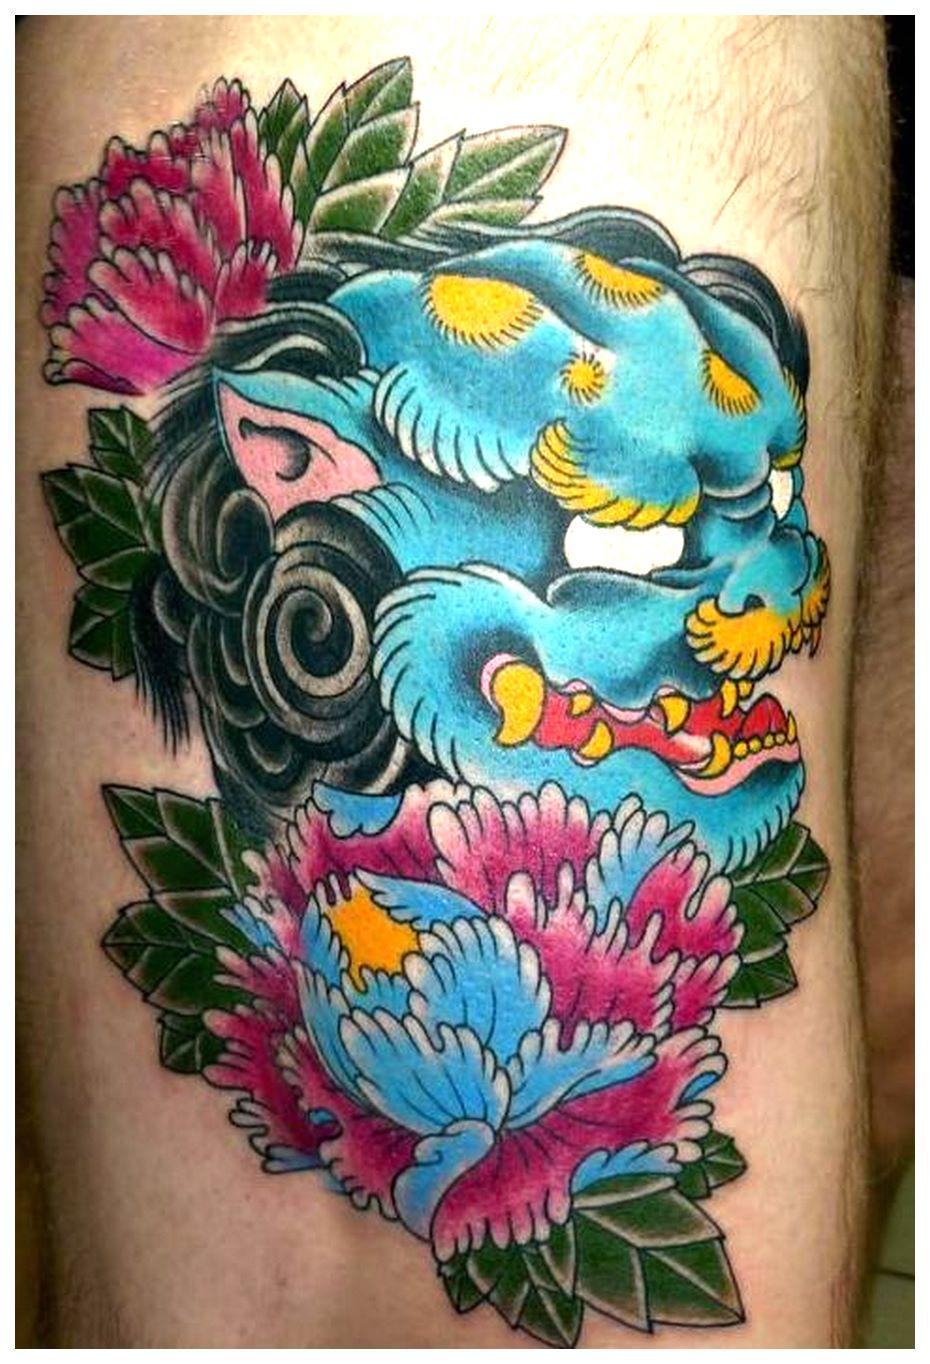 foo dog tattoo inner arm